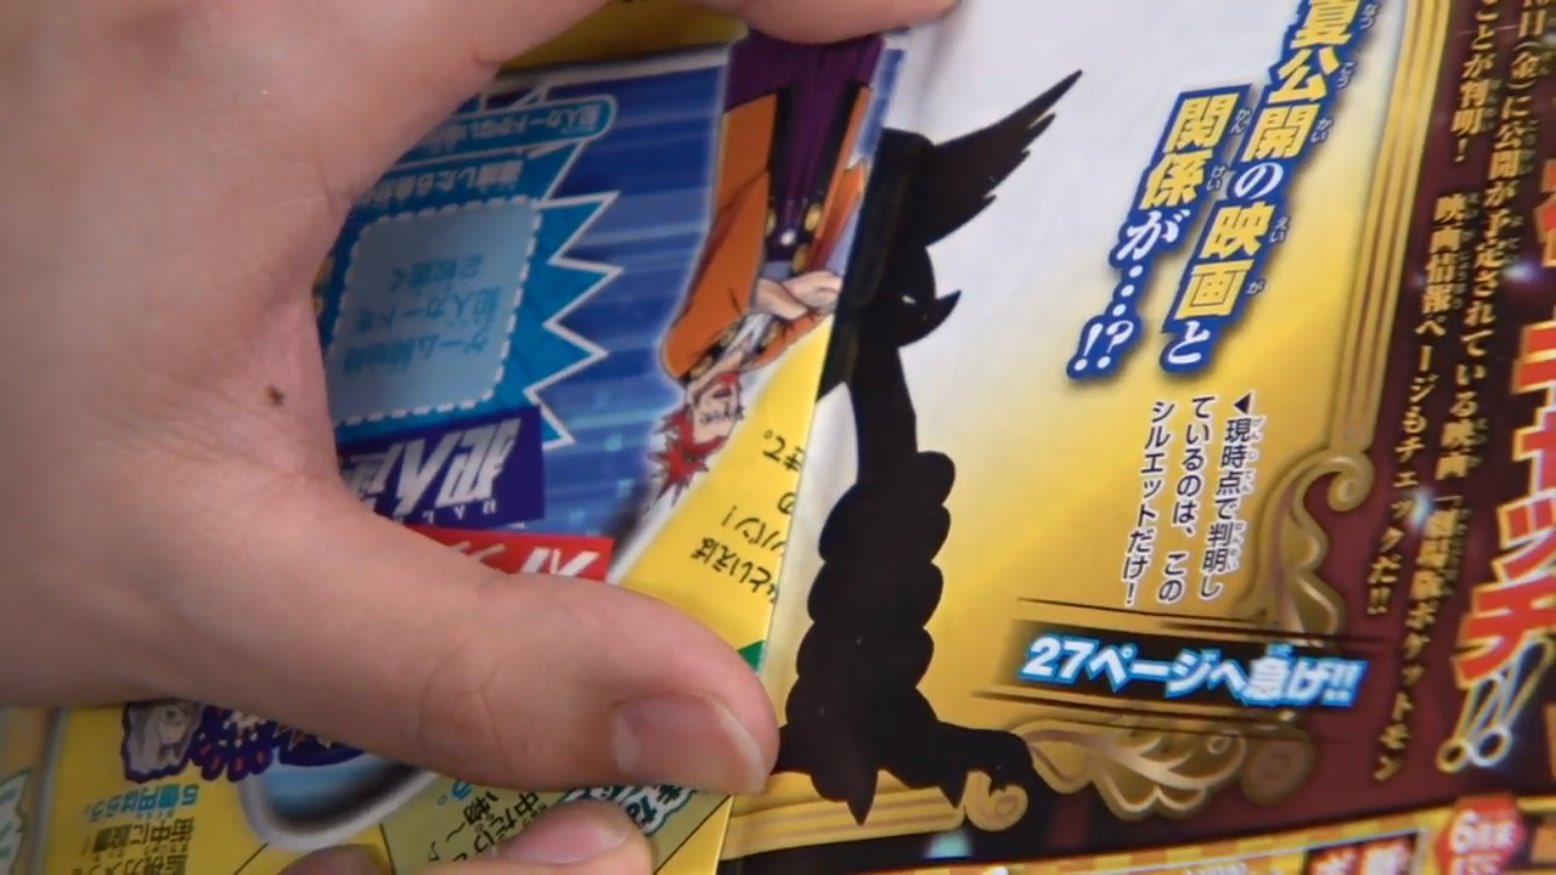 [Nintendo] L'univers Pokémon - Page 13 EQlLepGXsAQq8Xl?format=jpg&name=large